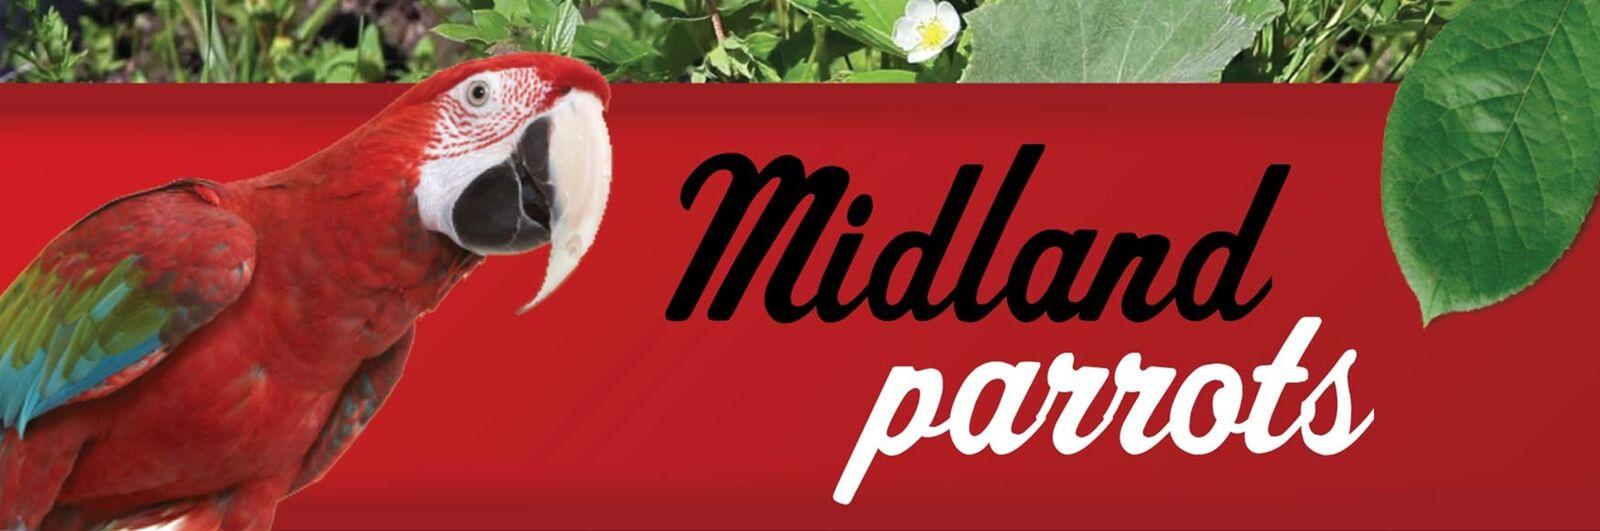 Midland Parrots Ltd